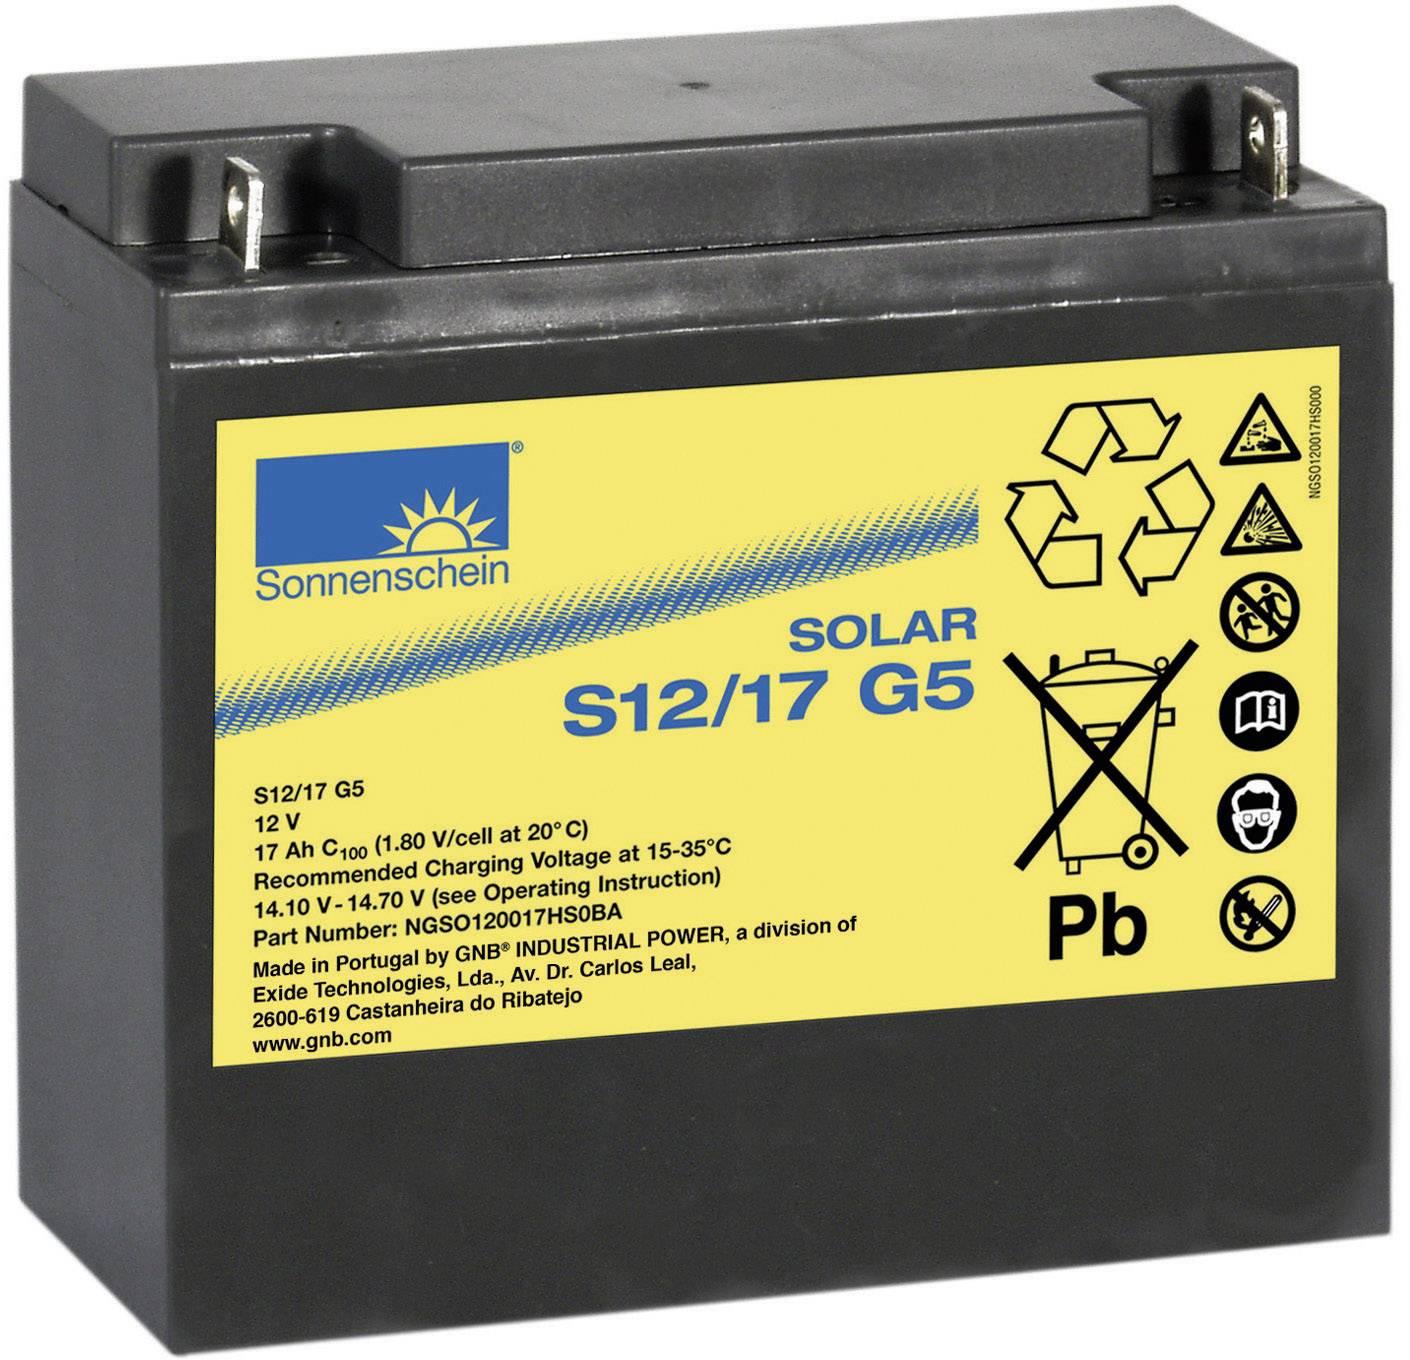 Solárny akumulátor GNB Sonnenschein dryfit S12/17 G5 985006, 12 V, 17 Ah